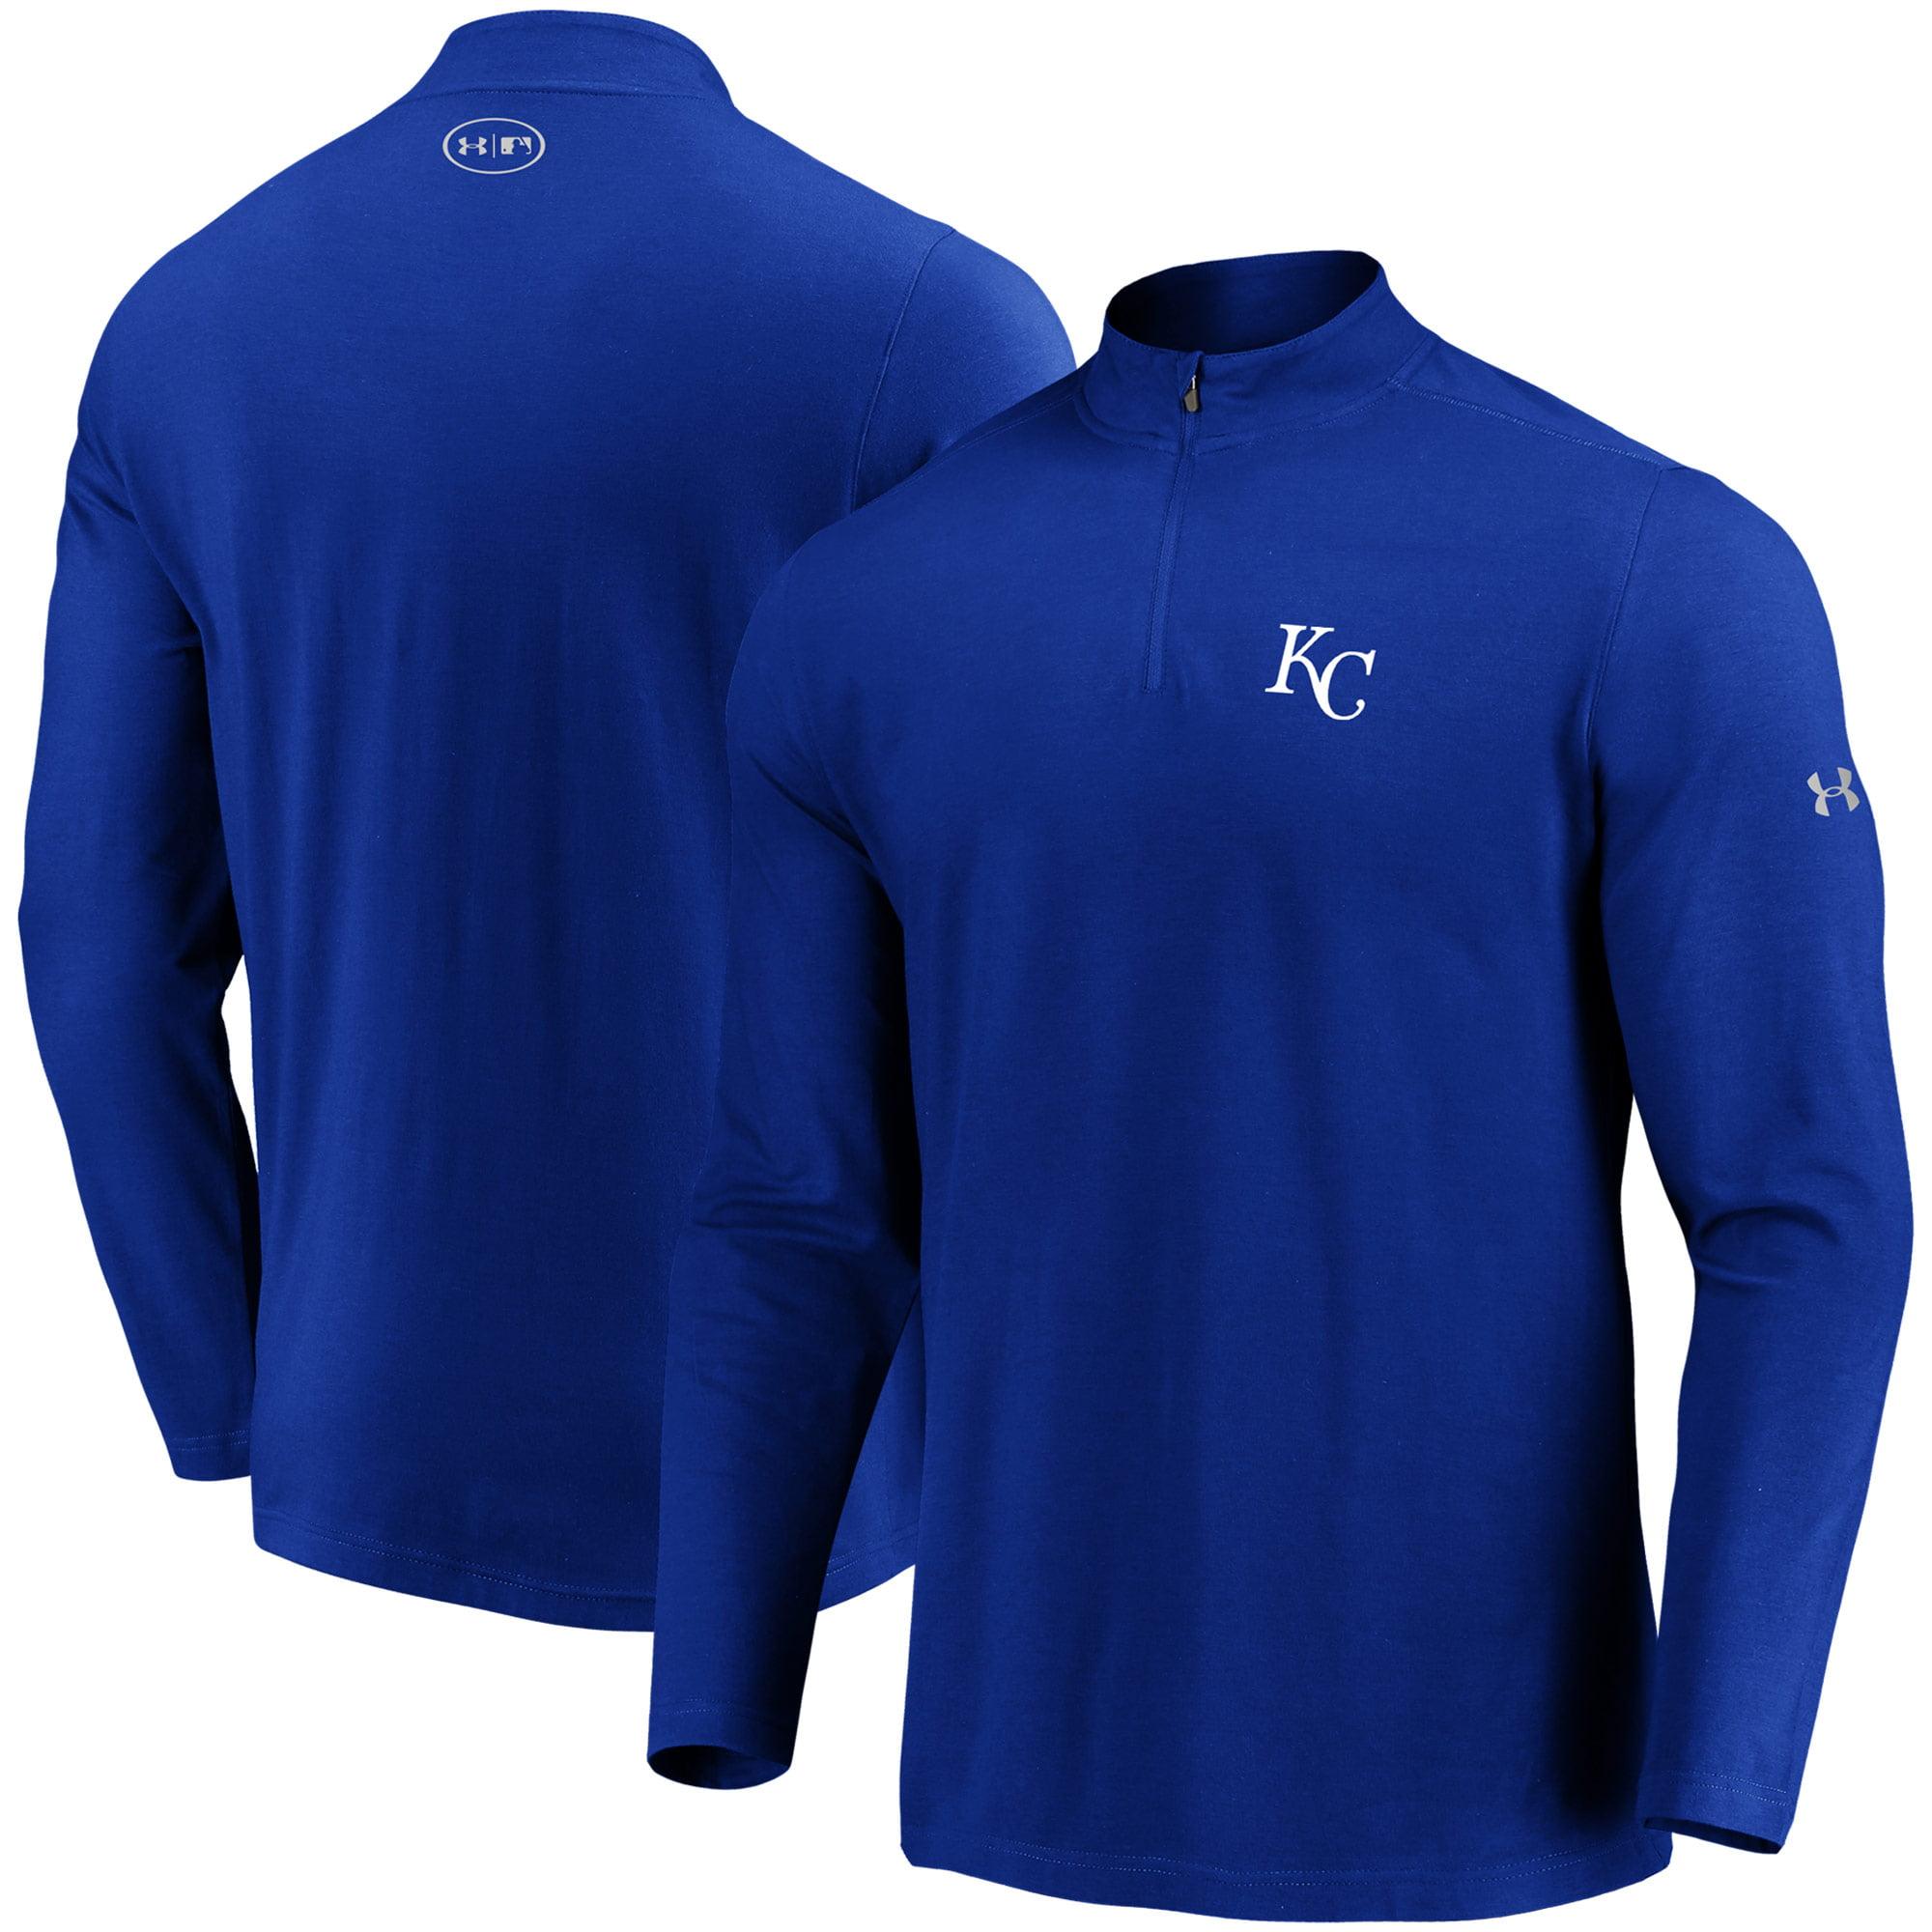 Kansas City Royals Under Armour Passion Performance Tri-Blend Quarter-Zip Pullover Jacket - Royal